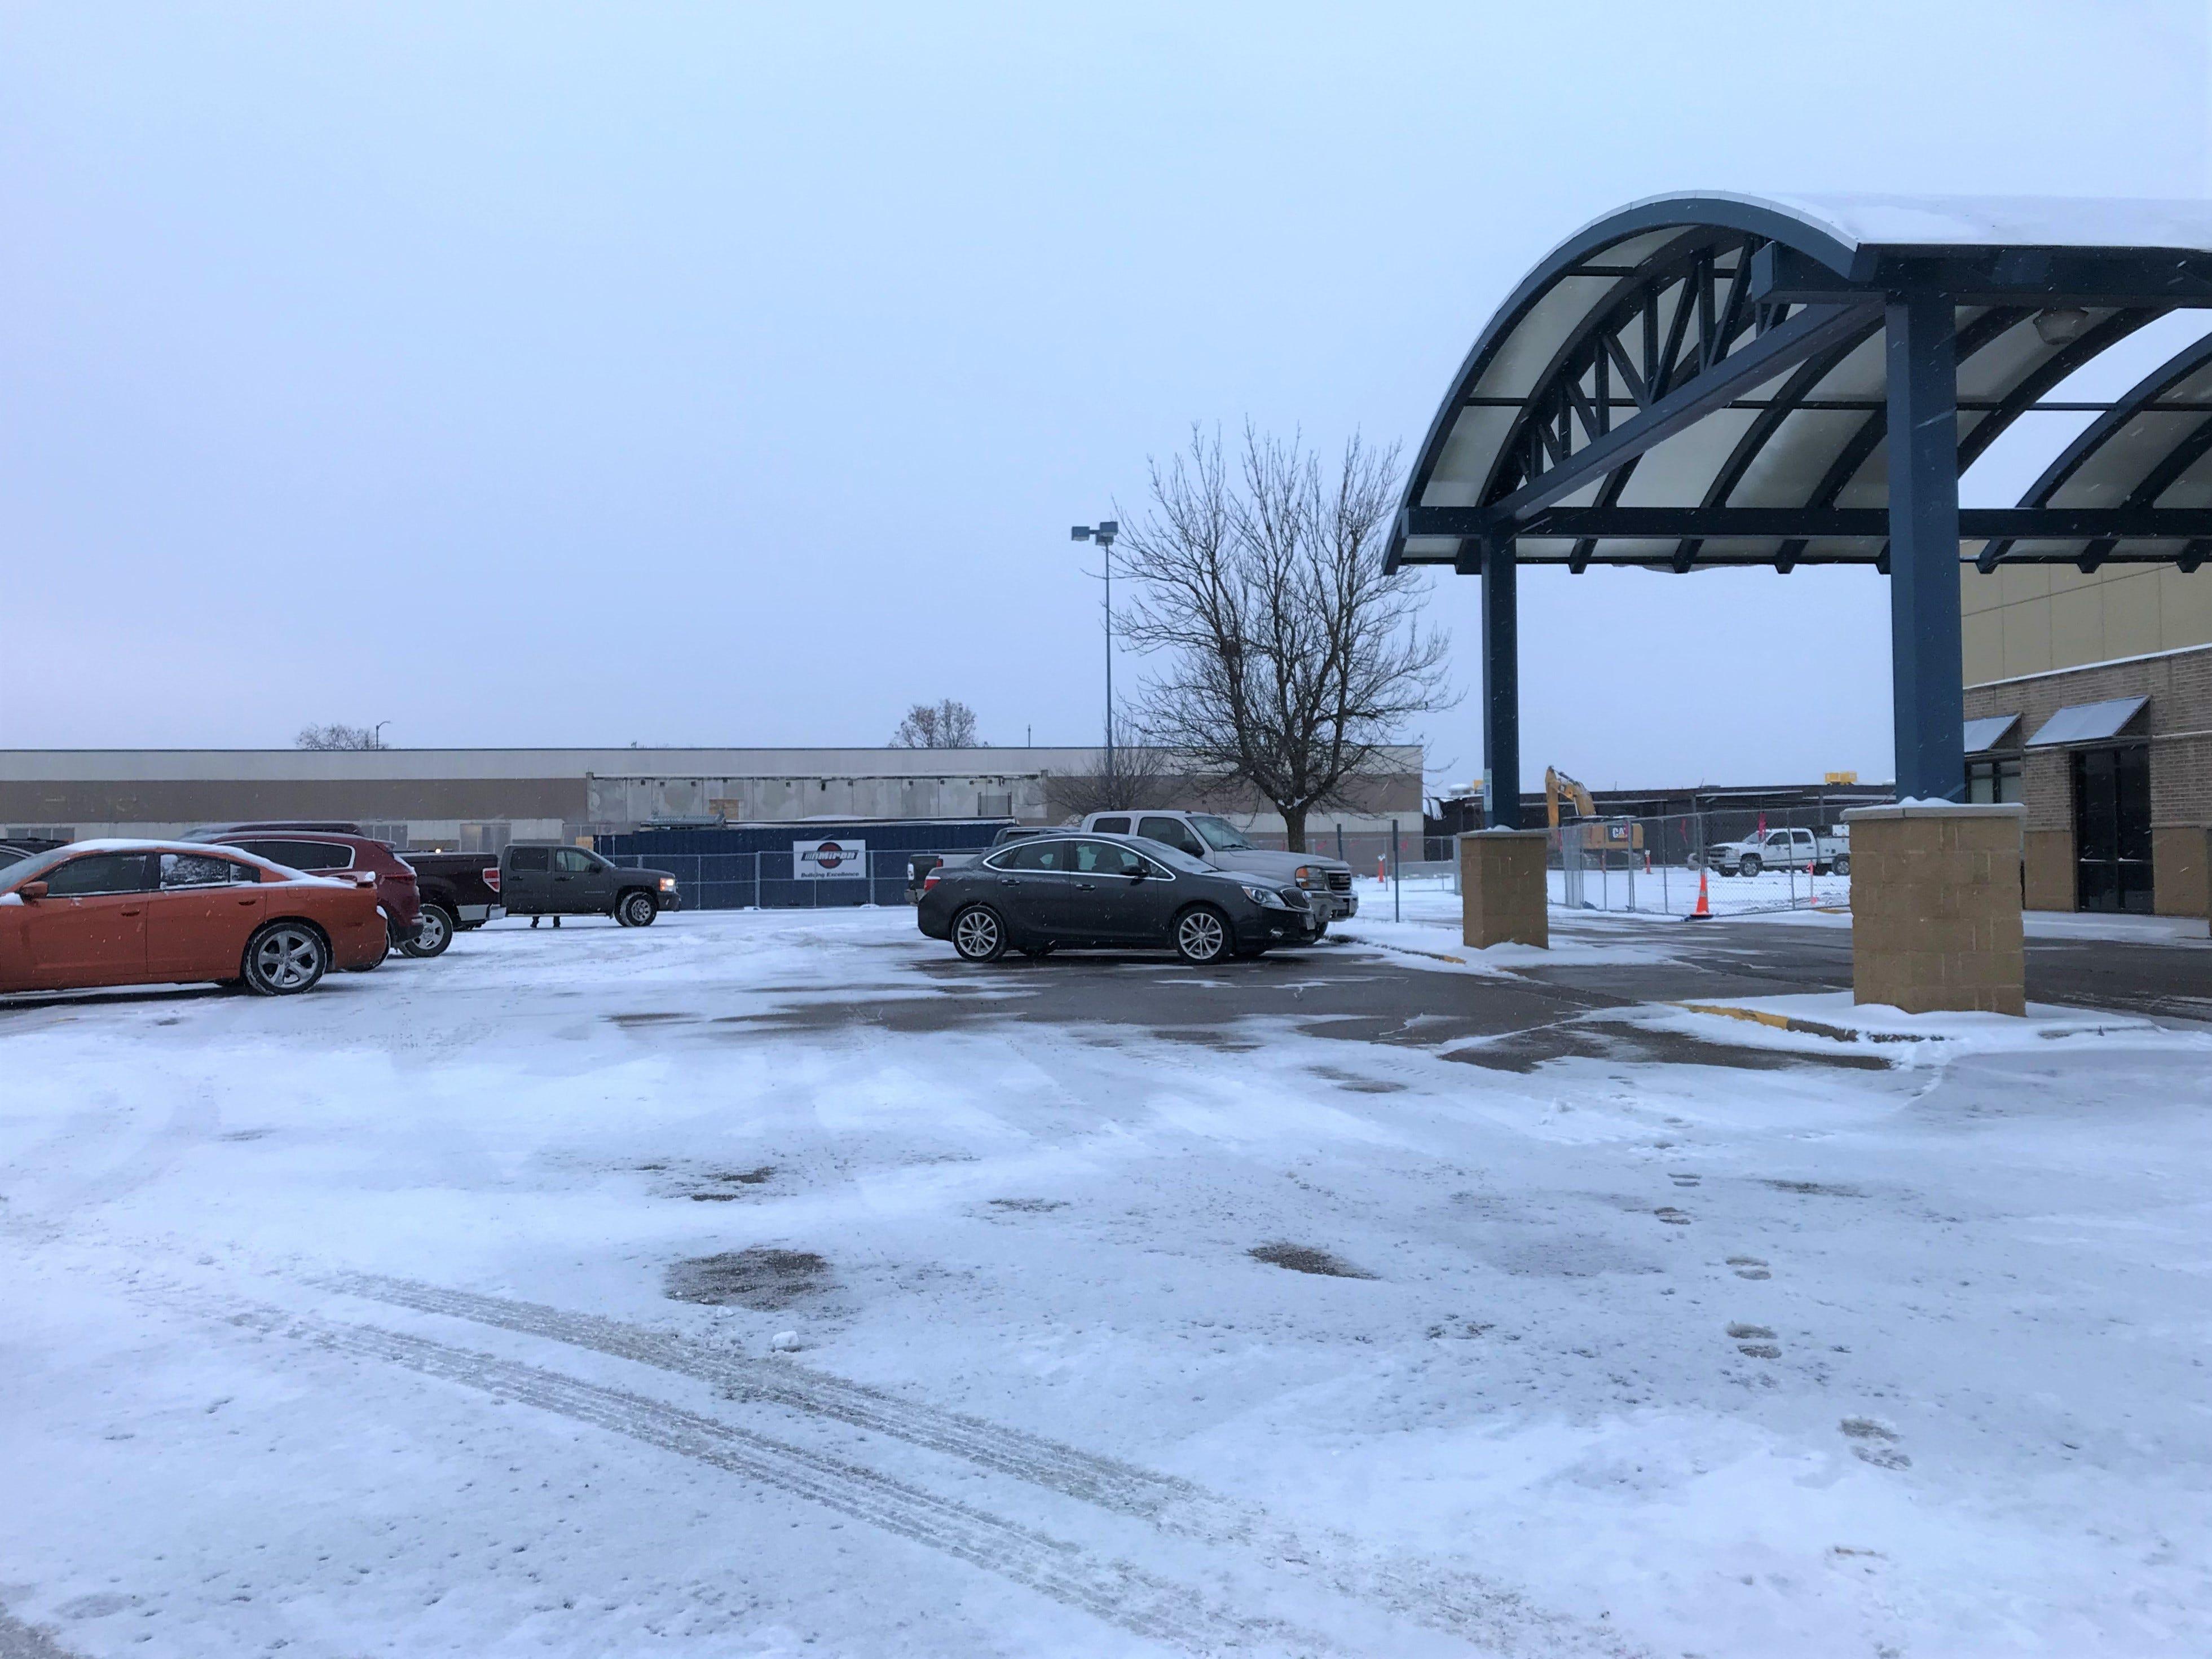 The VA Clinic is still operating near the former Rapids Mall. Photo taken Jan. 2, 2019.